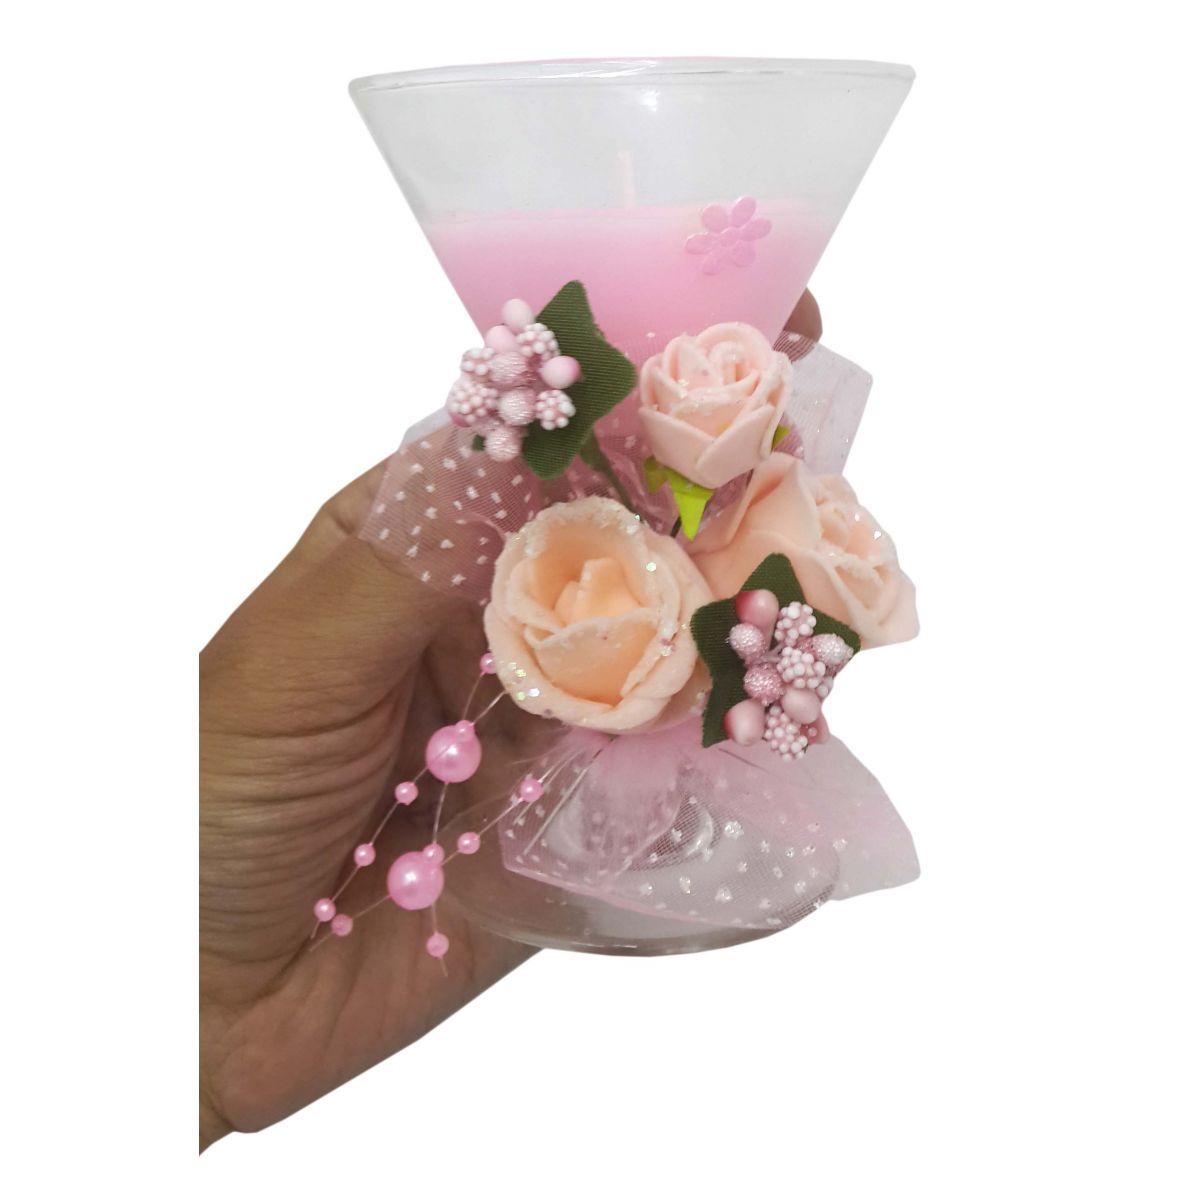 Vela Parafina Decorativa Media Larga Festas Casamento 15 Anos Flor Kit Com 12 Rosa (WL-D)